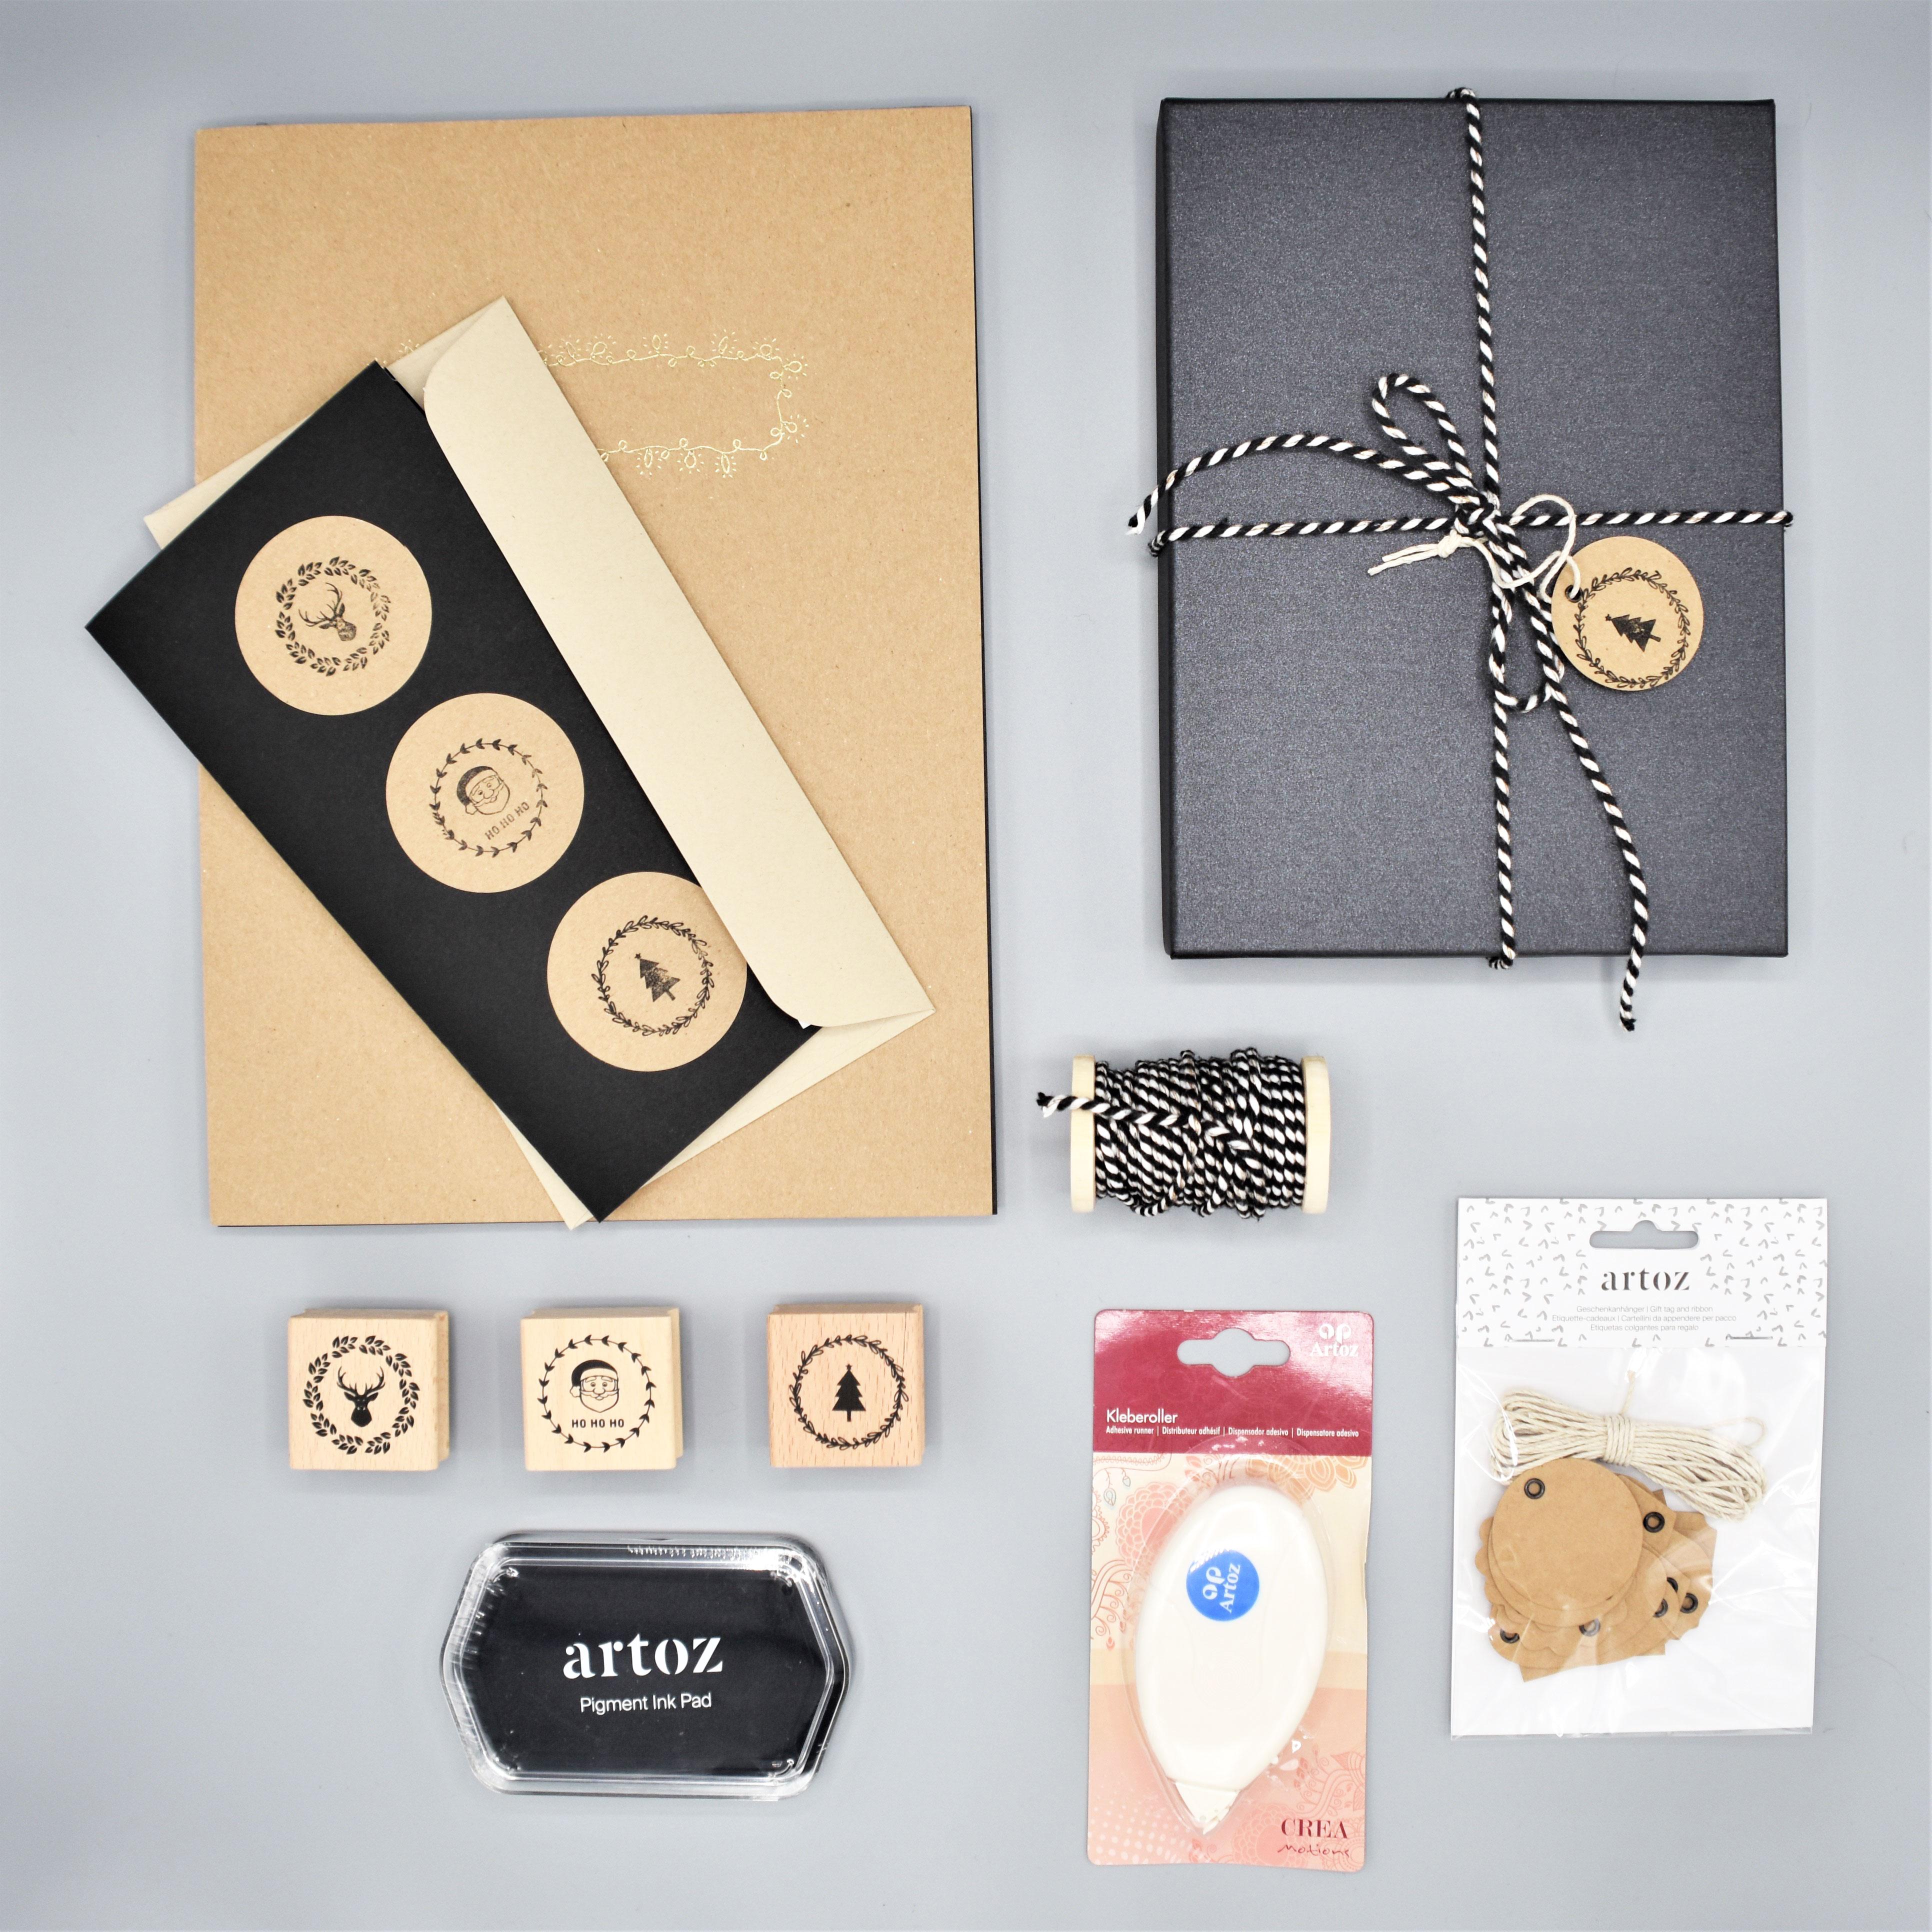 1_black-grocer-kraft_Weihnachtskarten-selber-gestalten_schwarz_grocer-kraft_kraftpapier_stempel_geschenkverpackungen-verzieren_handmade_selfmade_artoz_diy_grusskartenUa9I5ZF77tWES